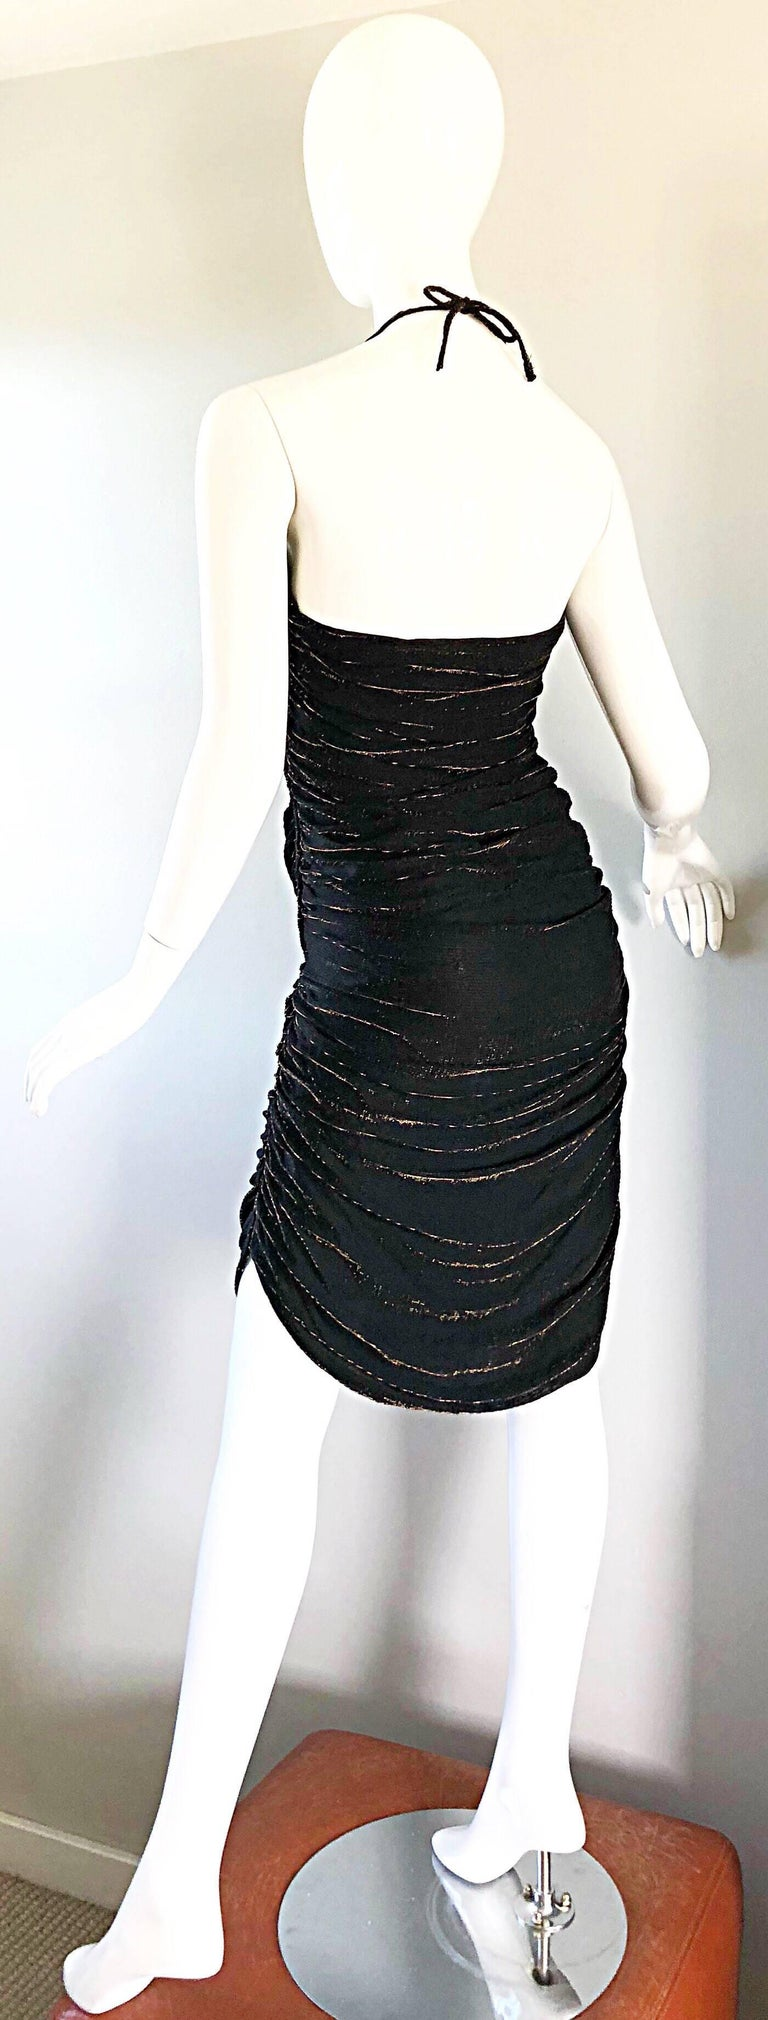 1970s Samir Black + Bronze Gold Sexy Ruched Studio 54 Vintage 70s Disco Dress For Sale 3